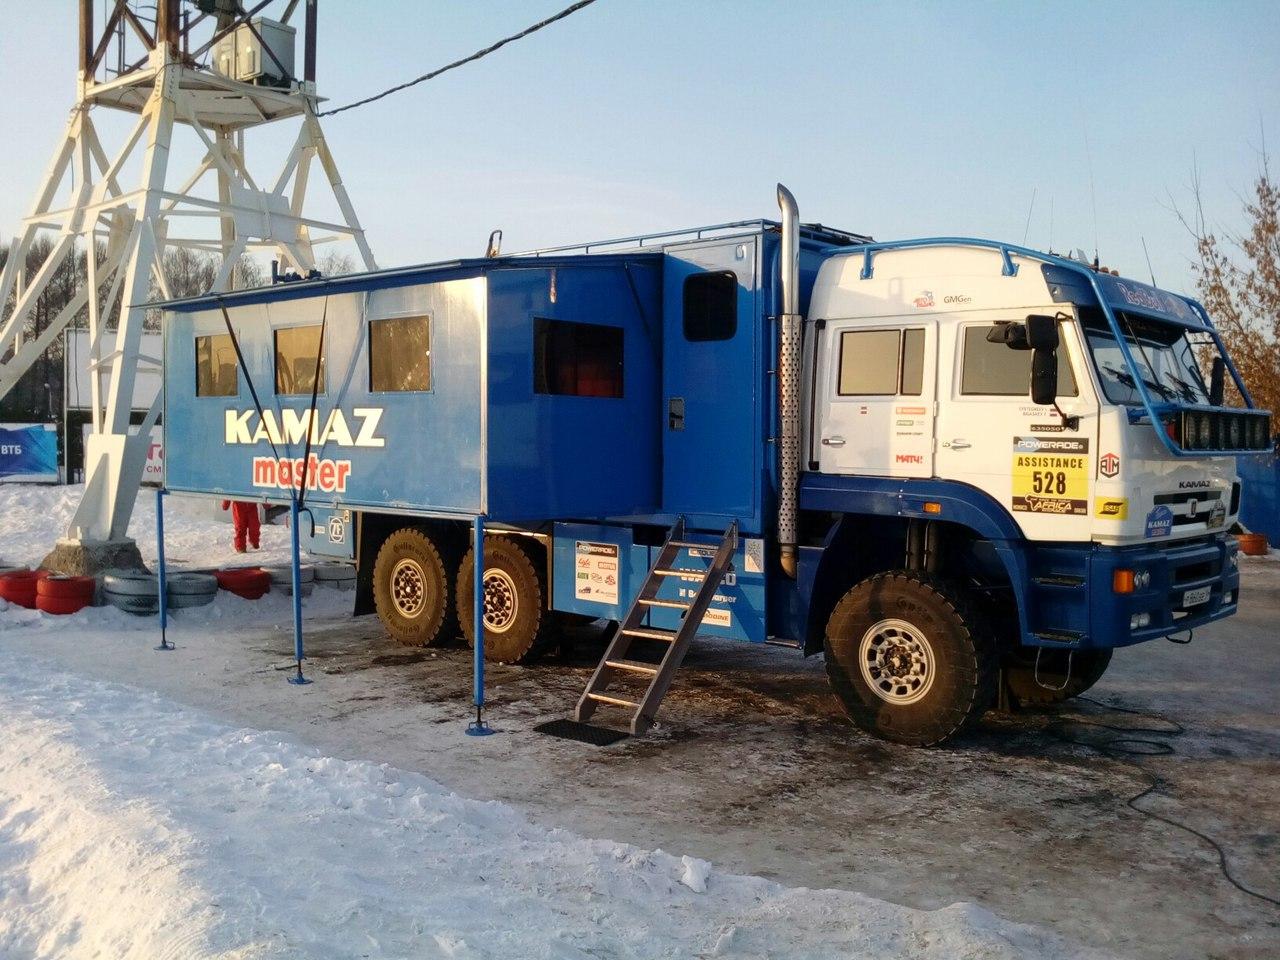 Дом на колёсах от команды КАМАЗ мастер.